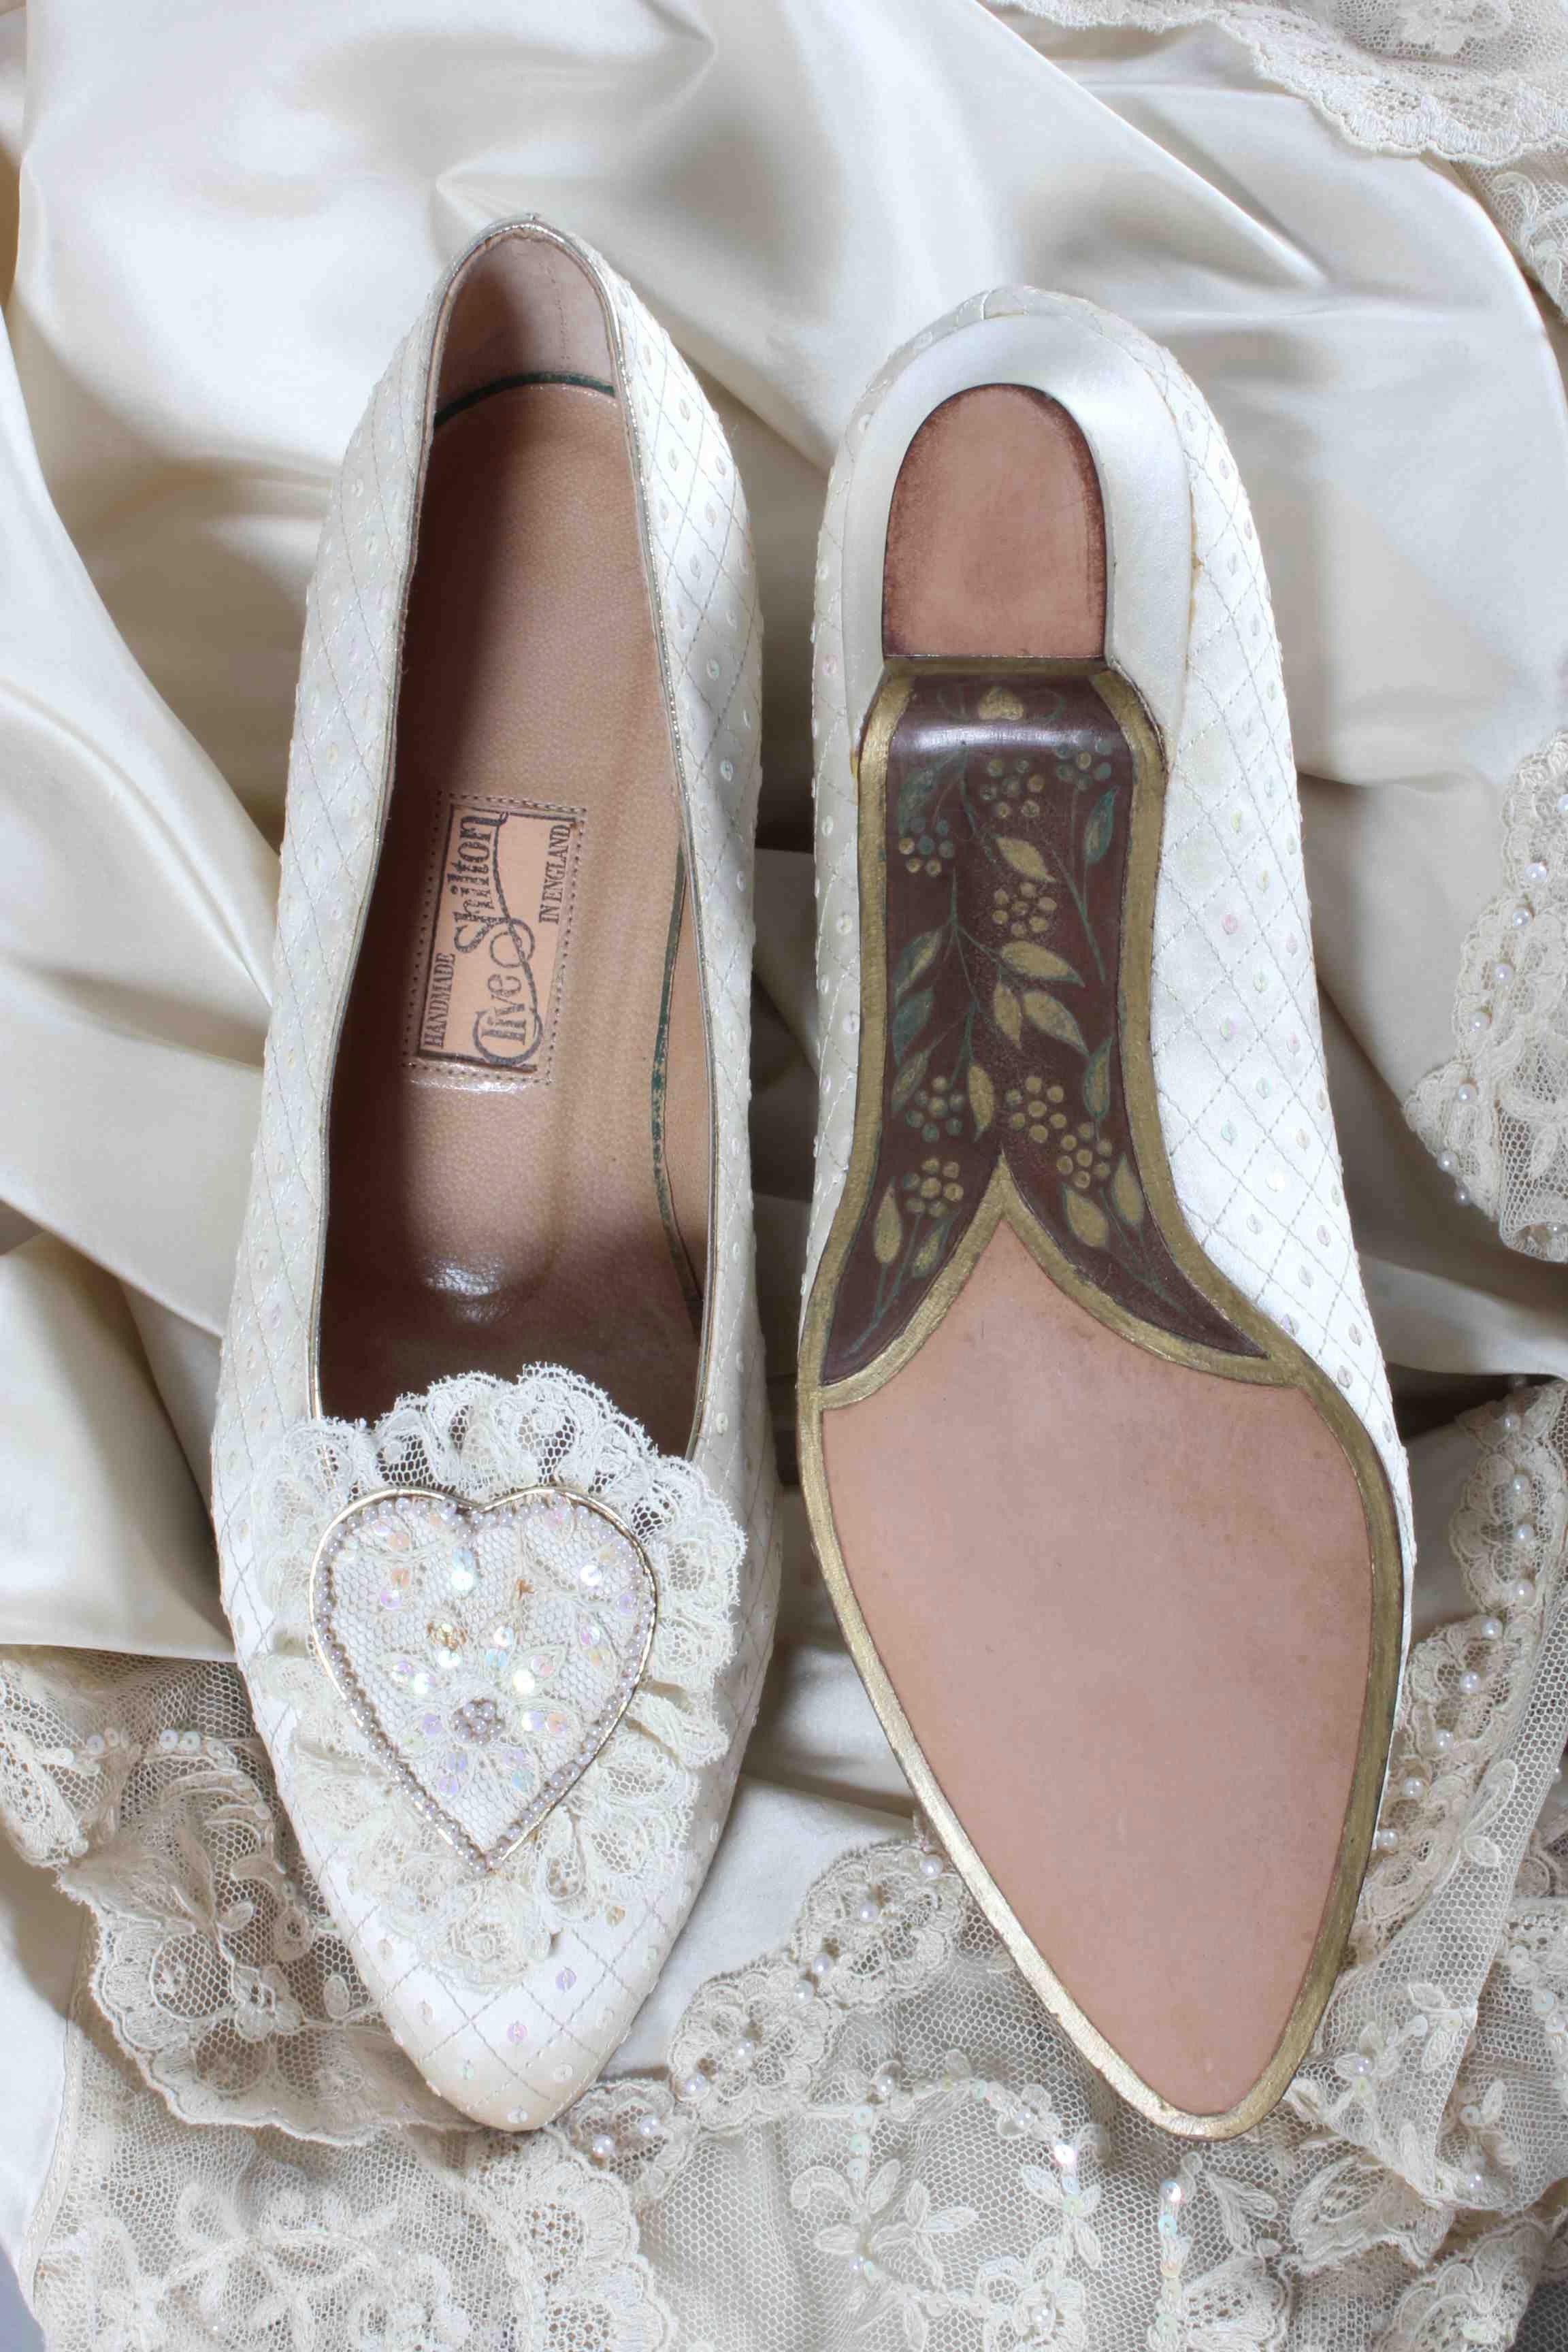 All The Hidden Details On Princess Diana's Wedding Dress